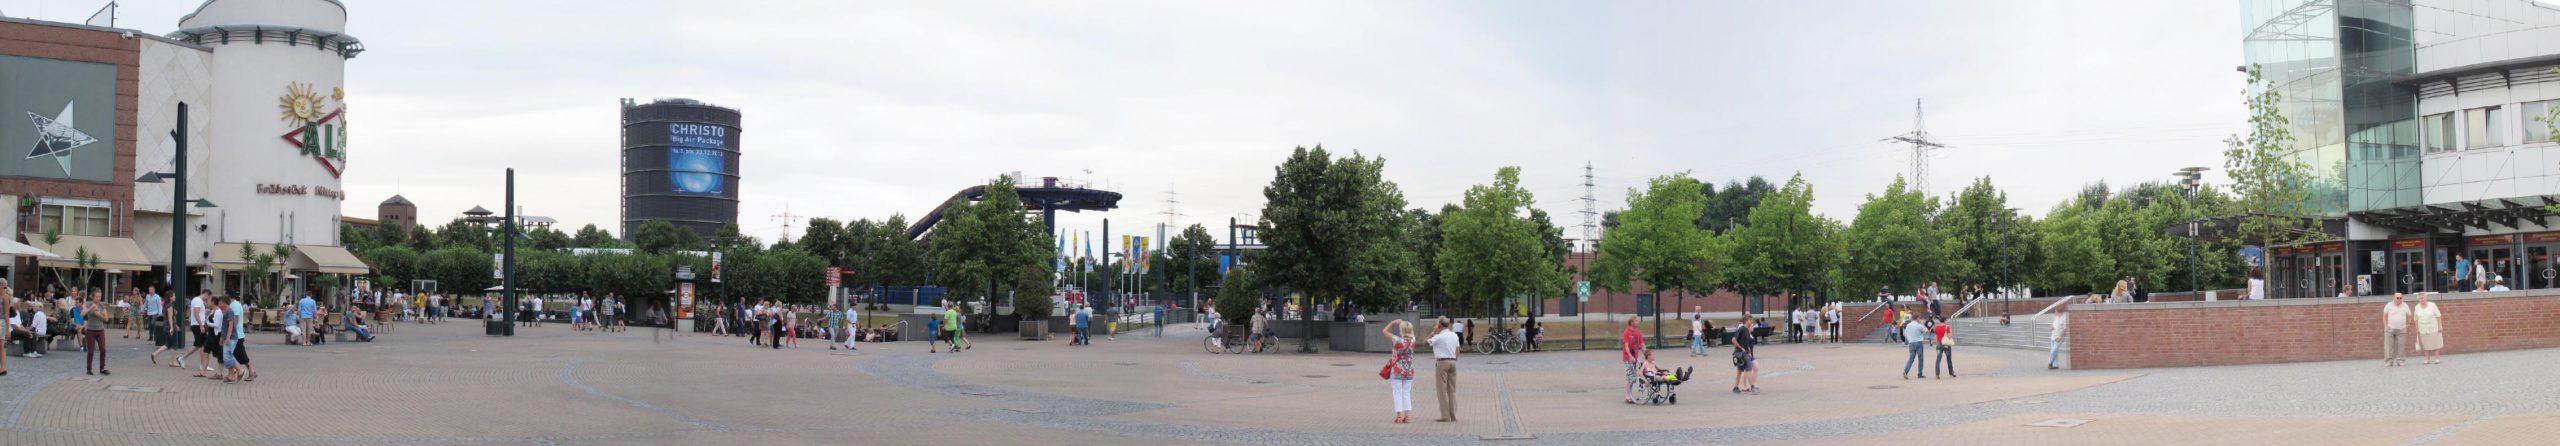 Luise-Albertz-Platz